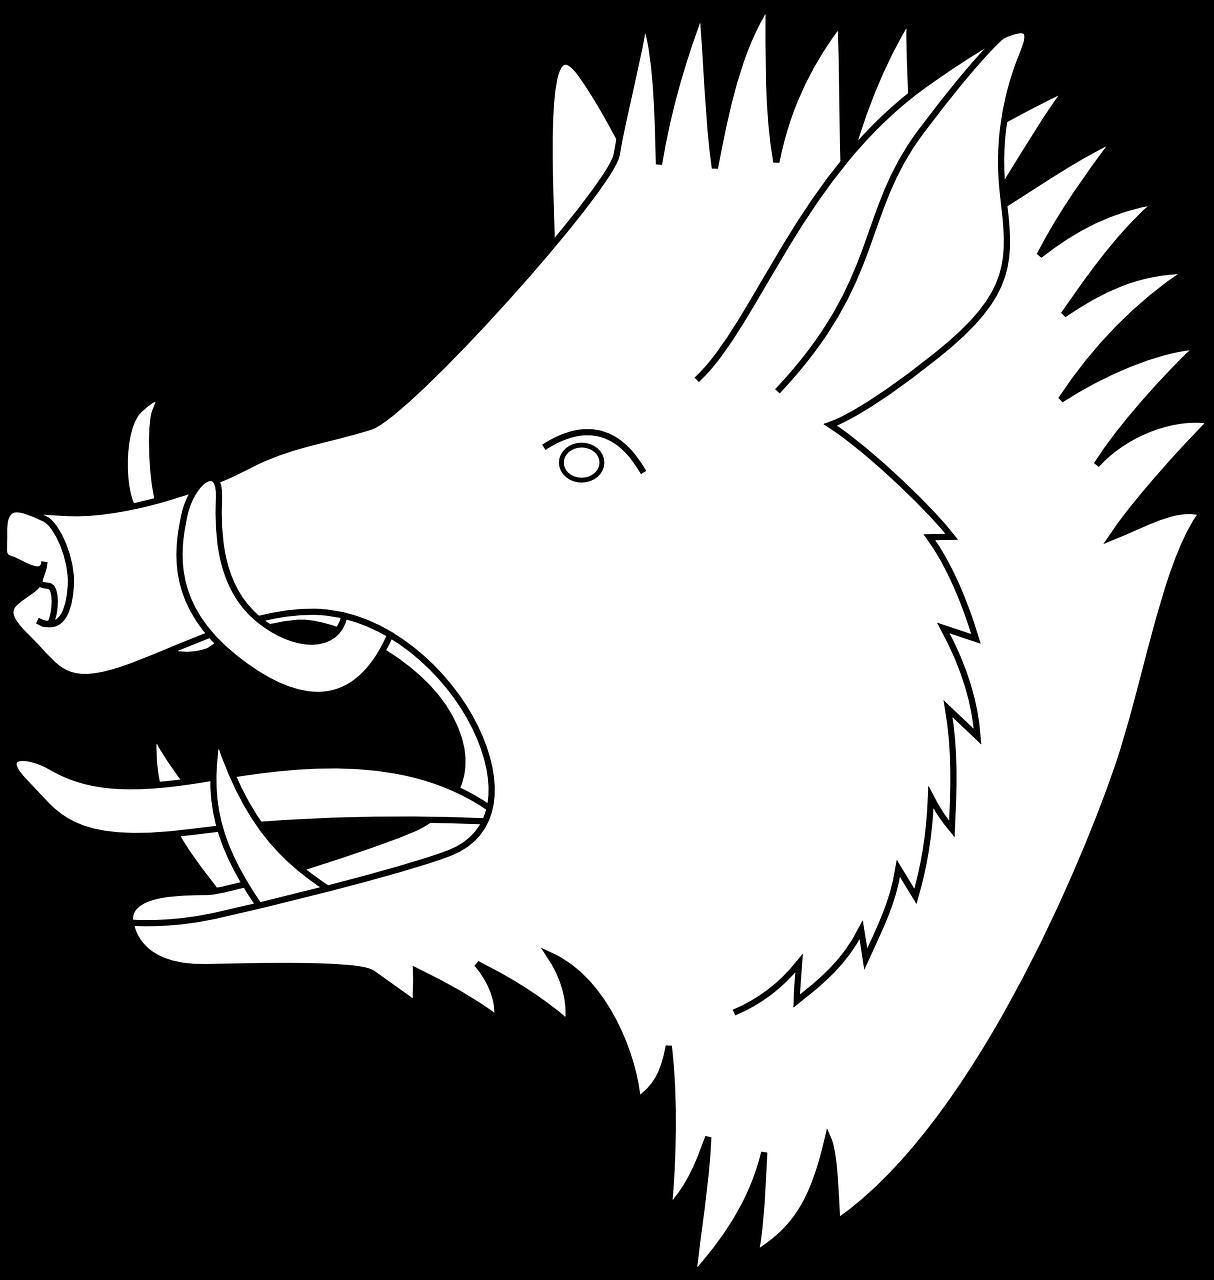 Boar Hog Pig Animal Head Free Image From Needpix